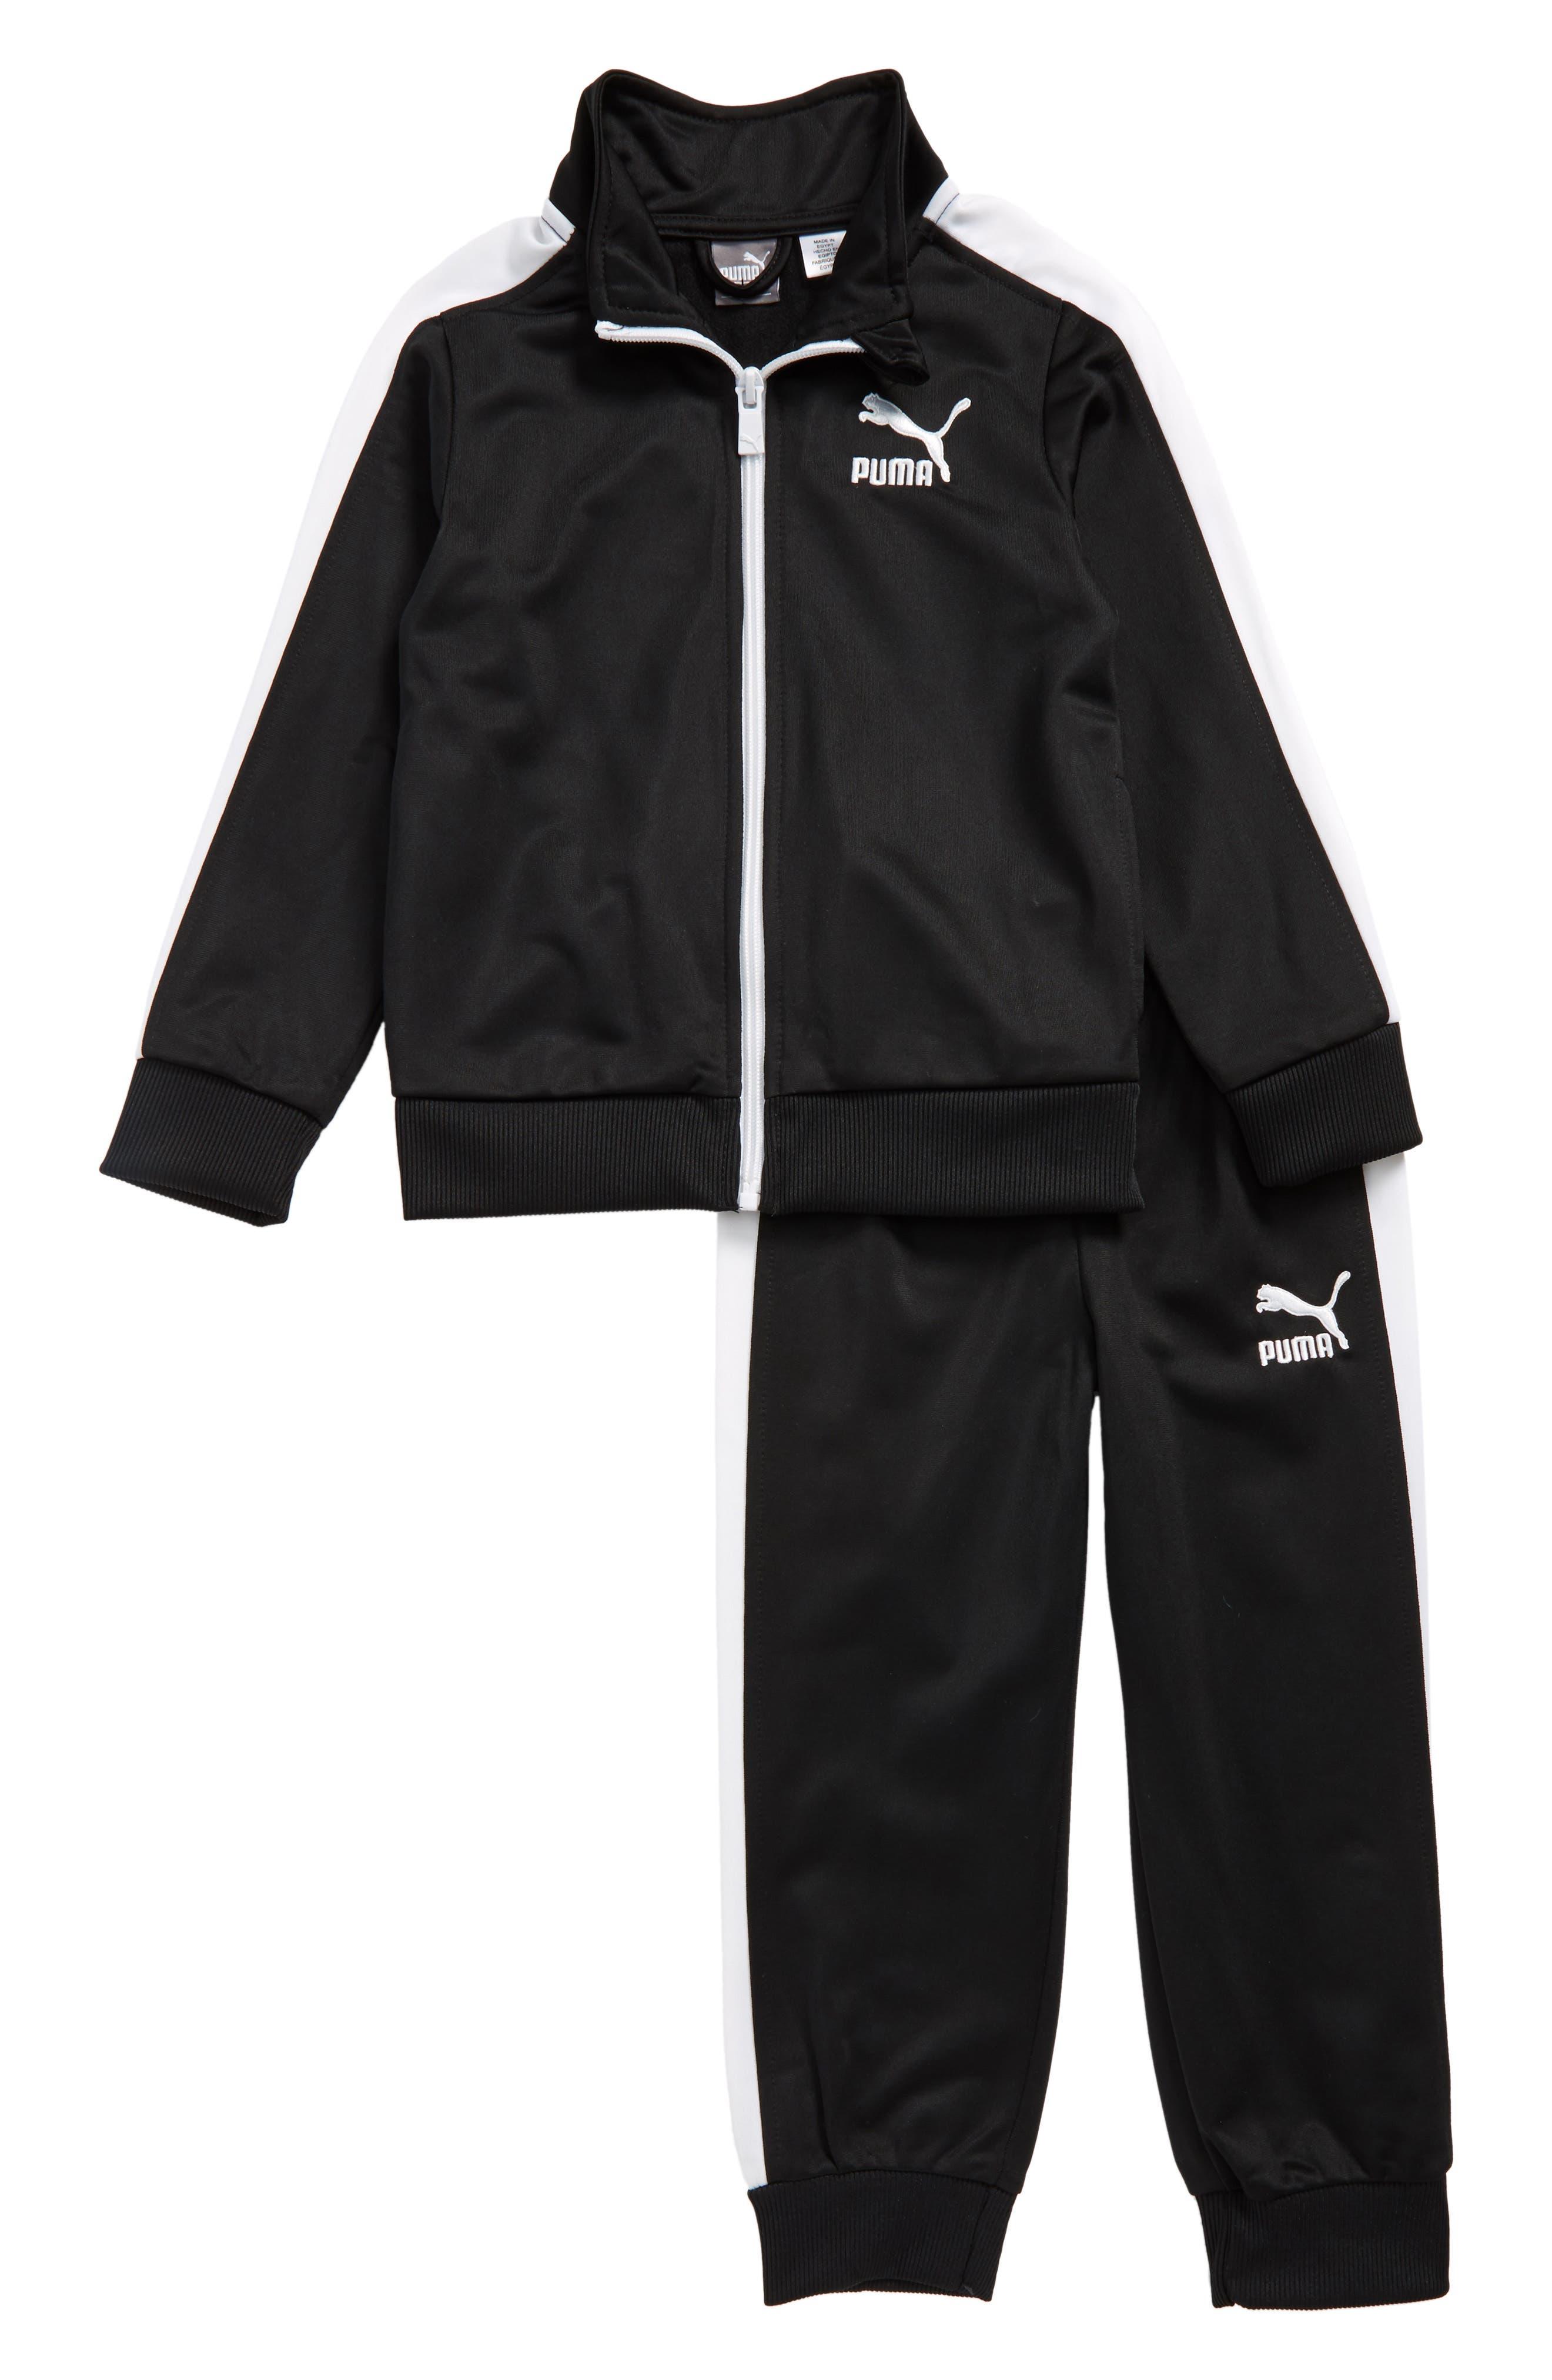 Alternate Image 1 Selected - PUMA Jacket & Sweatpants Set (Toddler Boys & Little Boys)